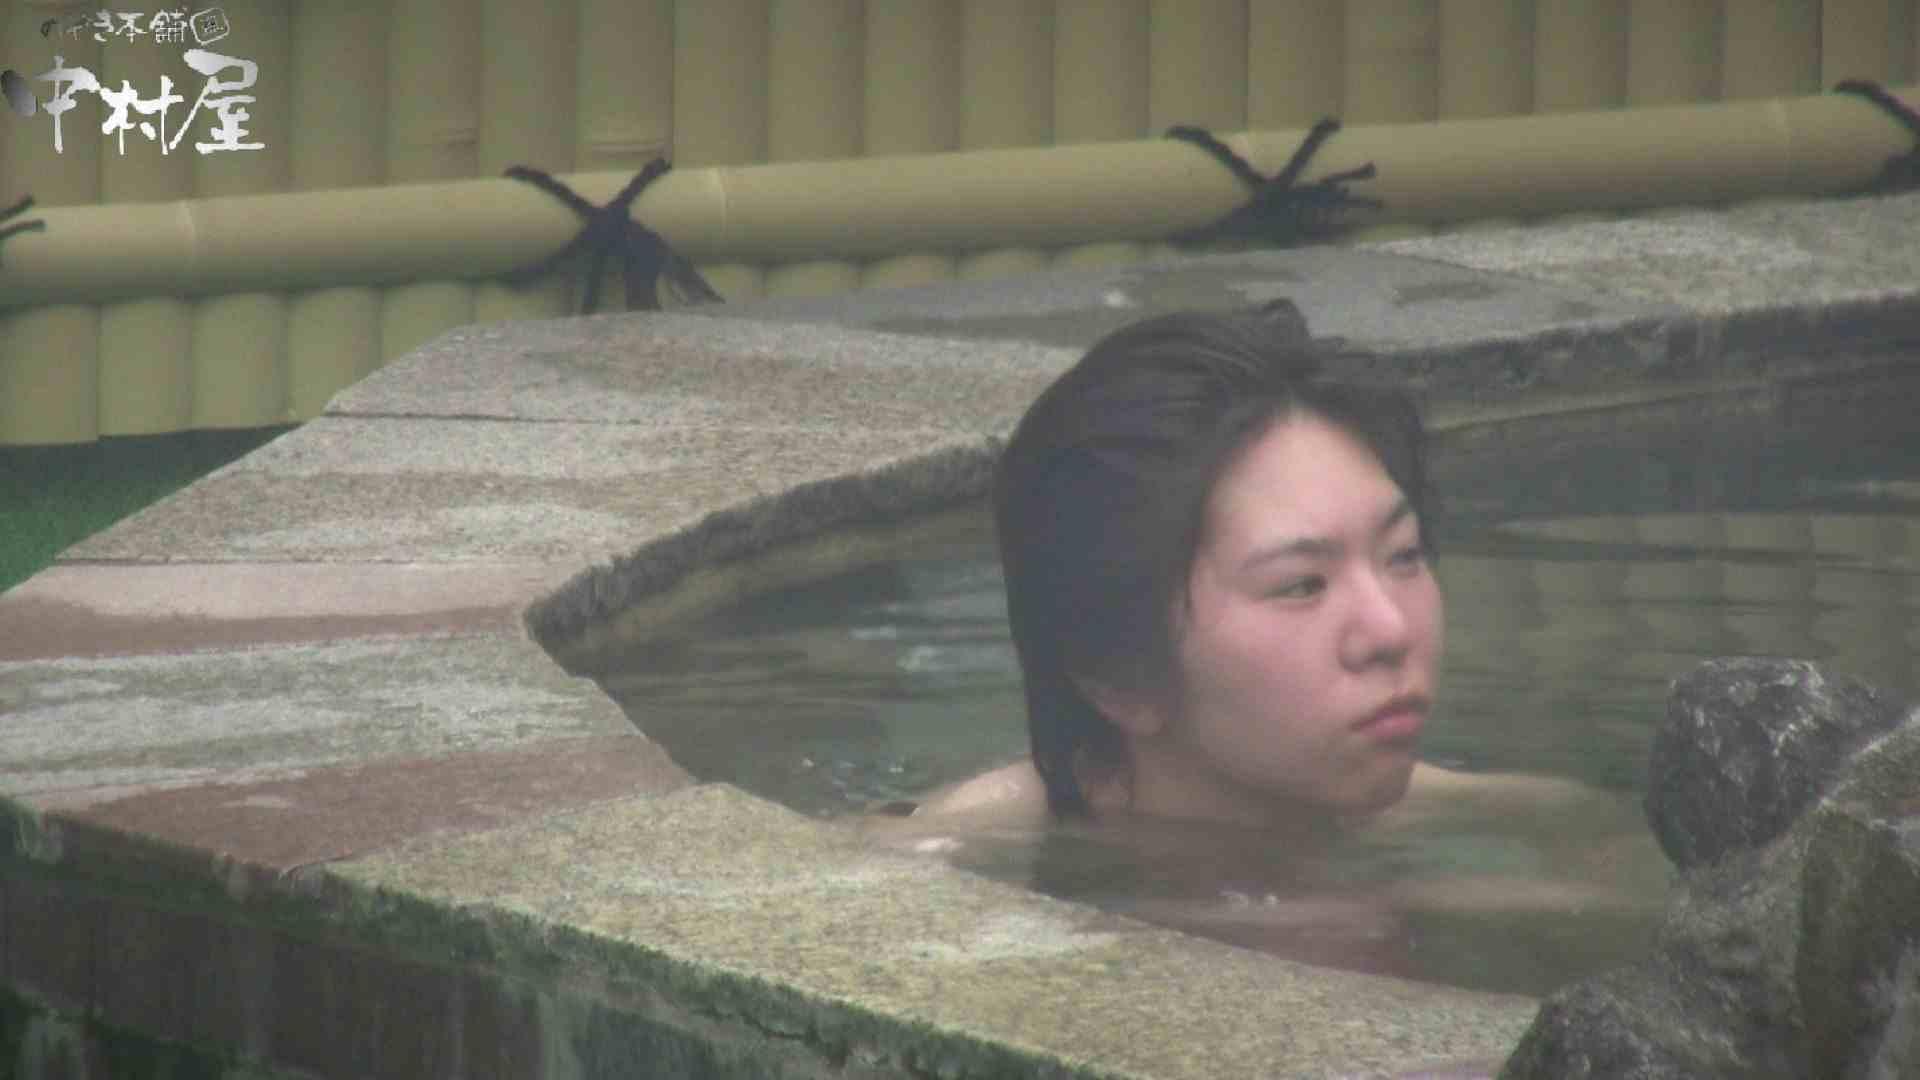 Aquaな露天風呂Vol.907 露天風呂 隠し撮りオマンコ動画紹介 62連発 5